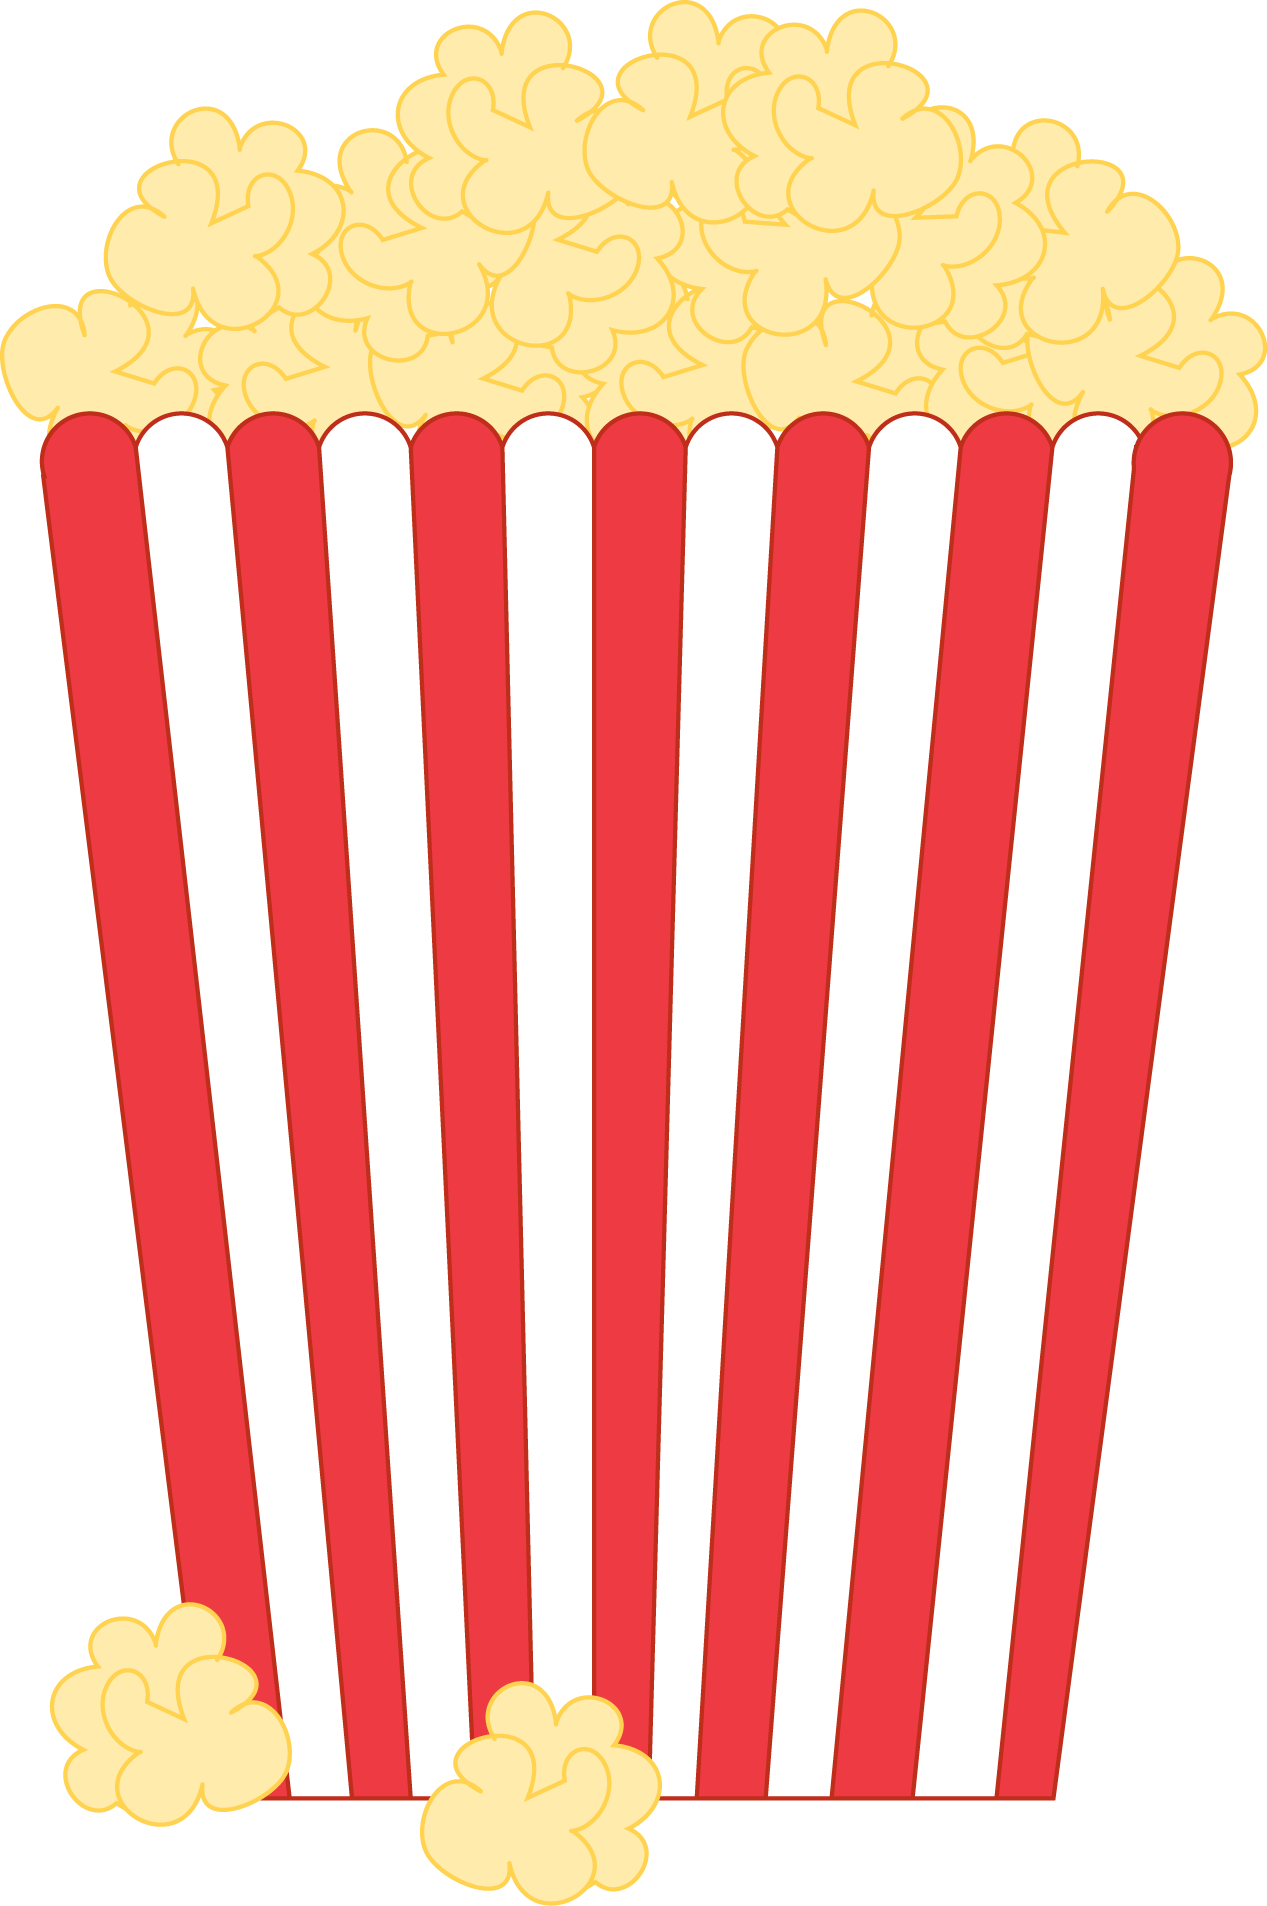 Popcorn clipart Popcorn popcorn  2 clipart